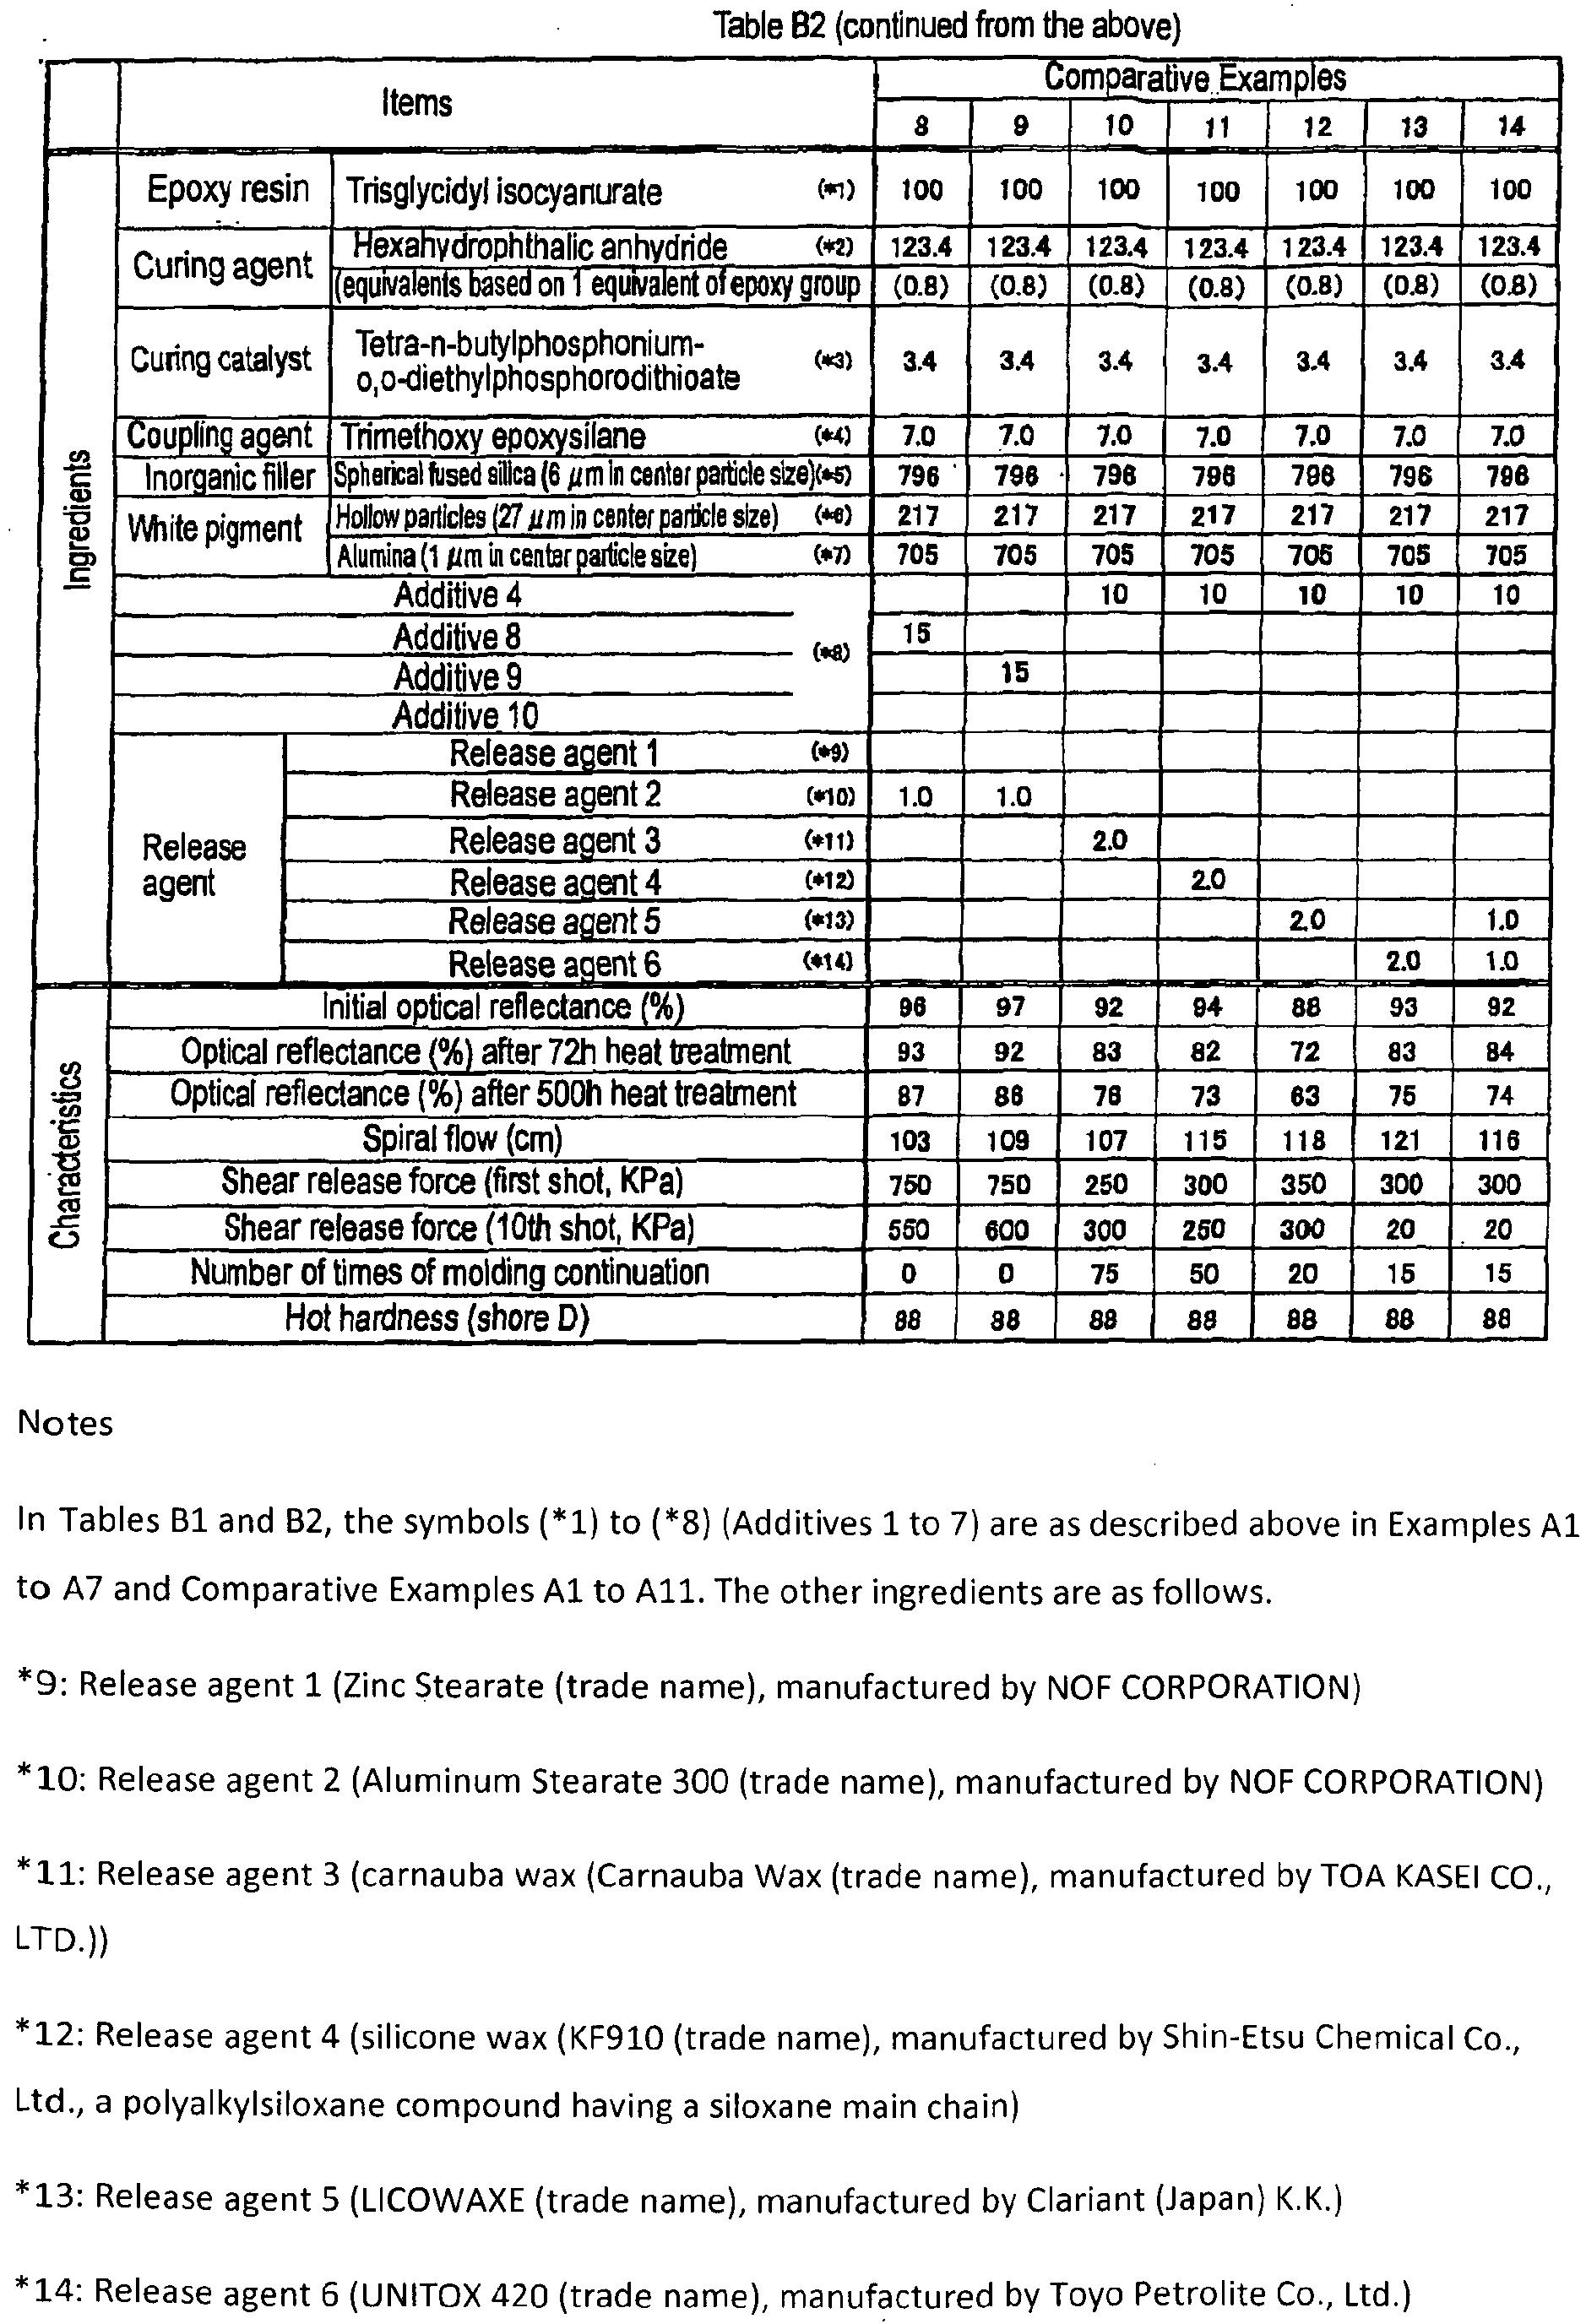 EP2540776B1 - Thermosetting light-reflecting resin